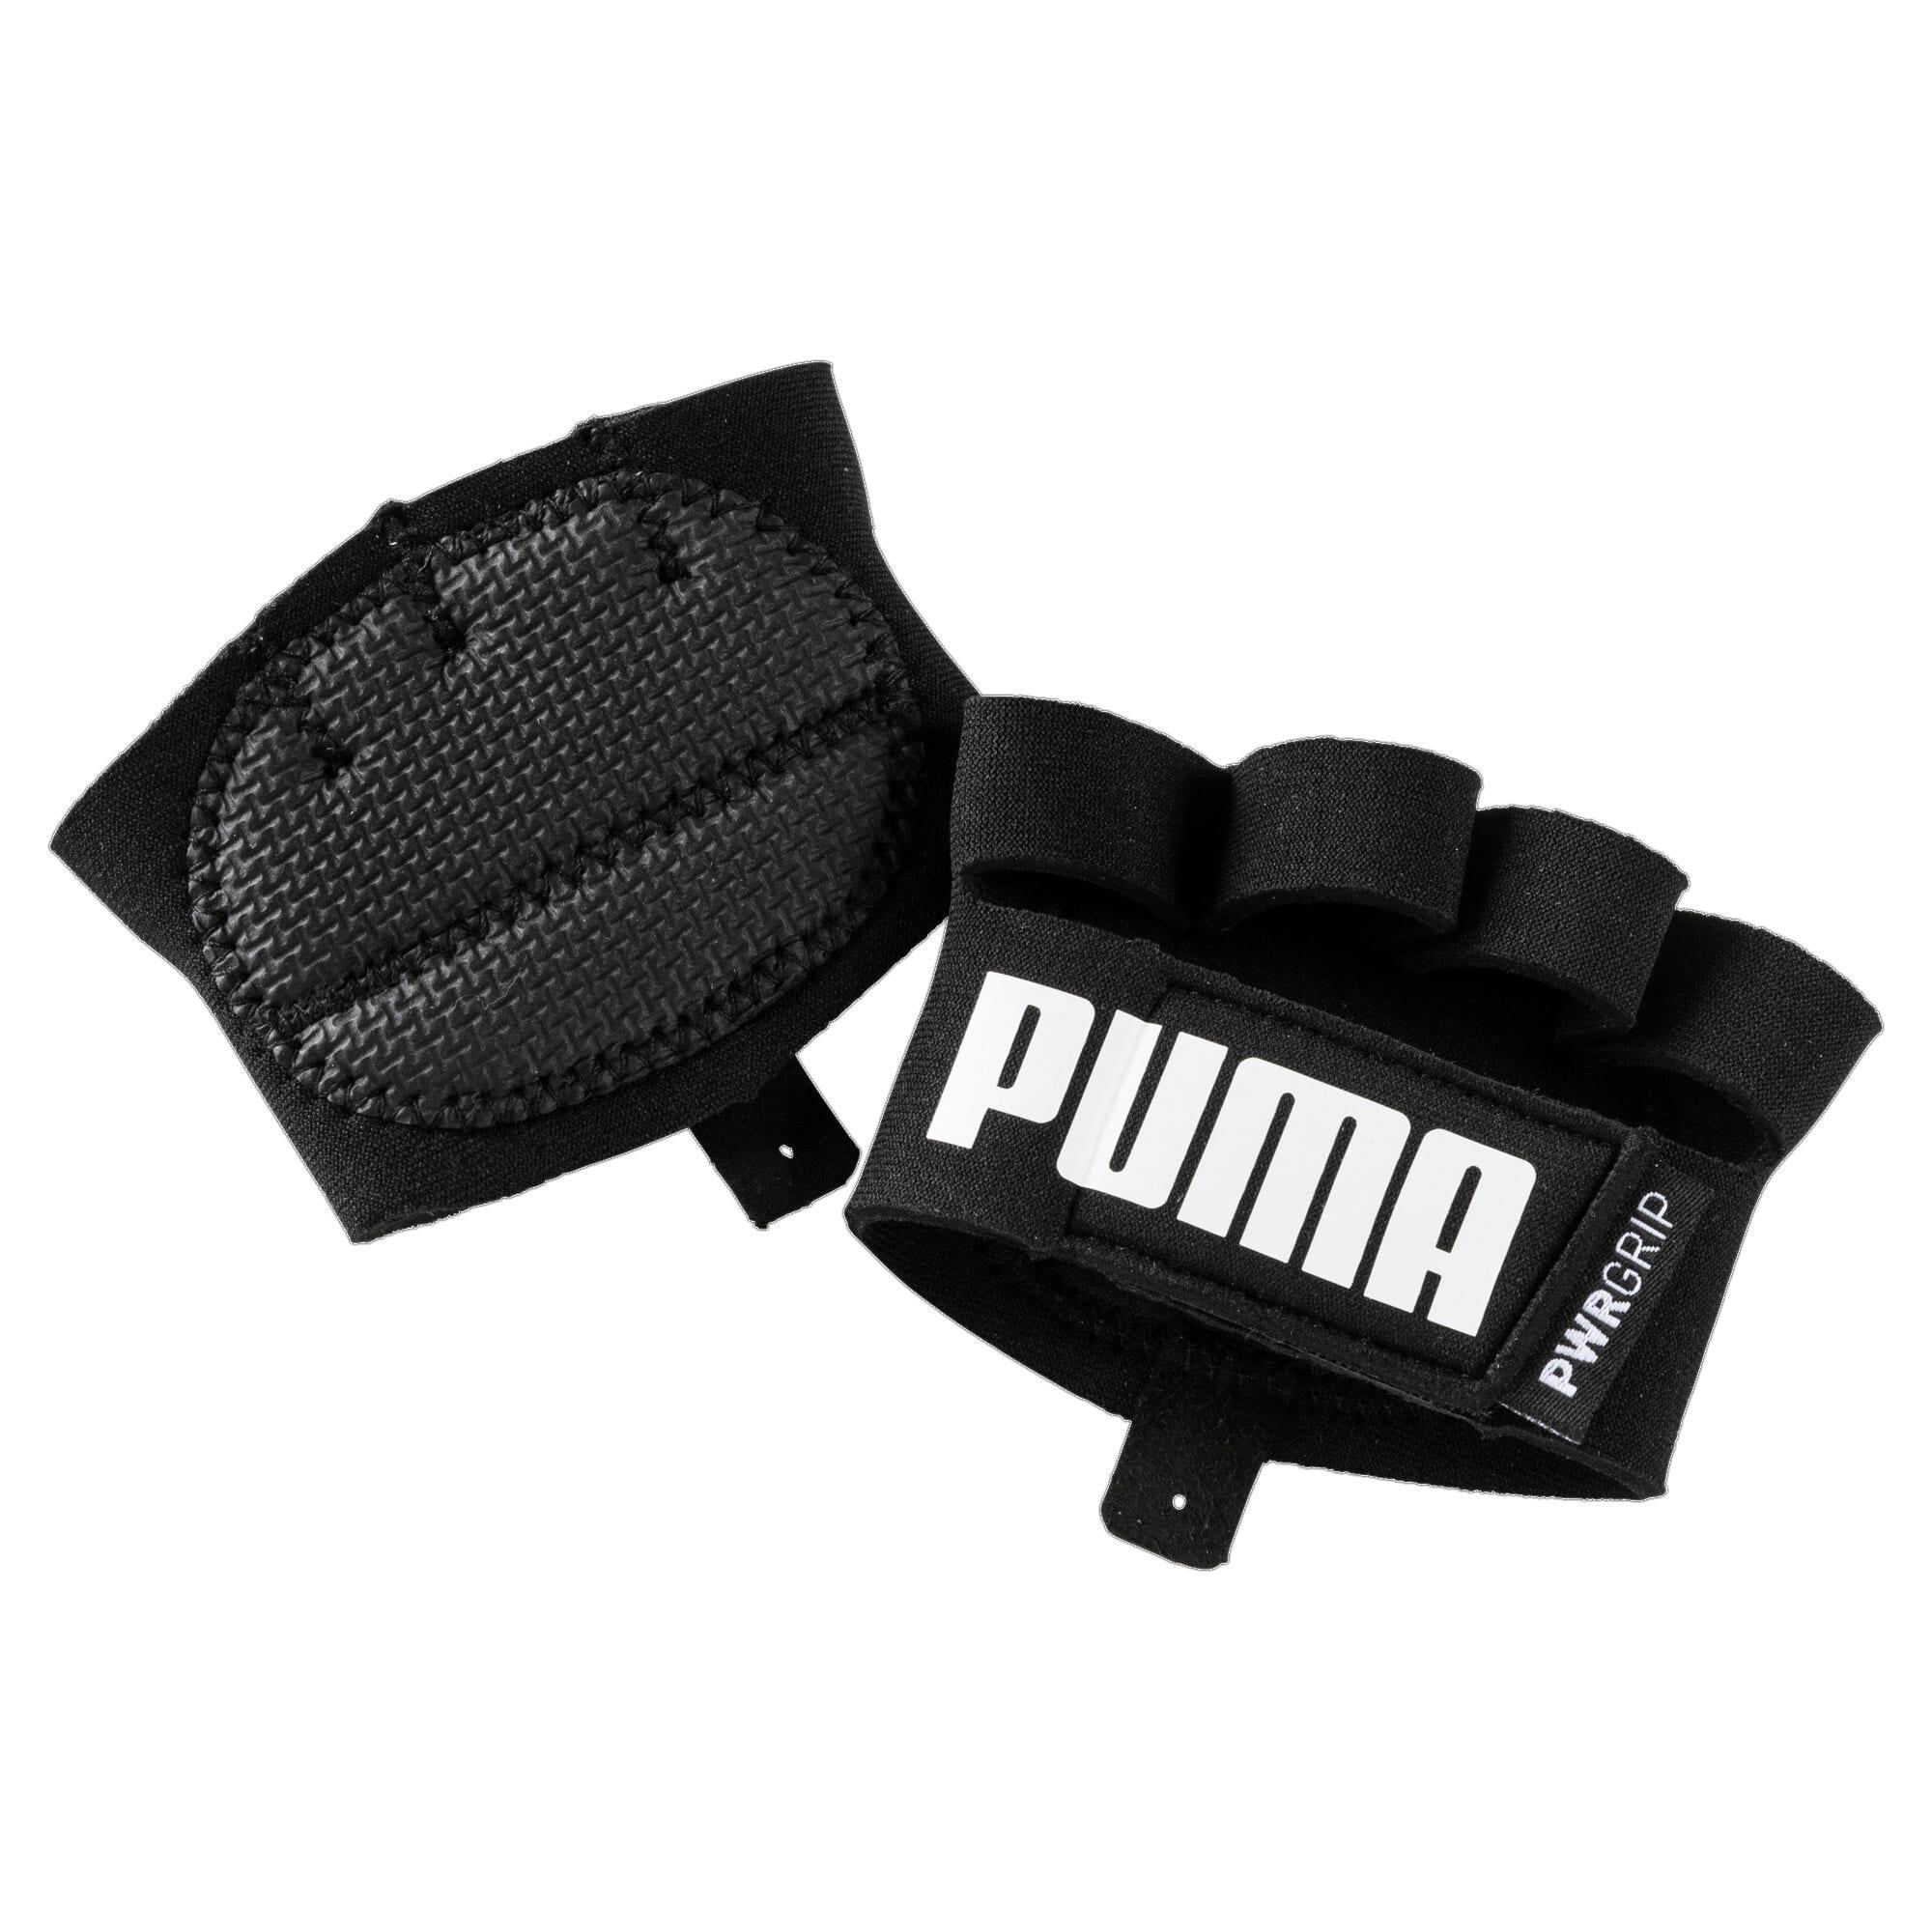 Thumbnail 1 of Trainingsbenodigdheden - Griphandschoenen, Puma Black-Puma White, medium